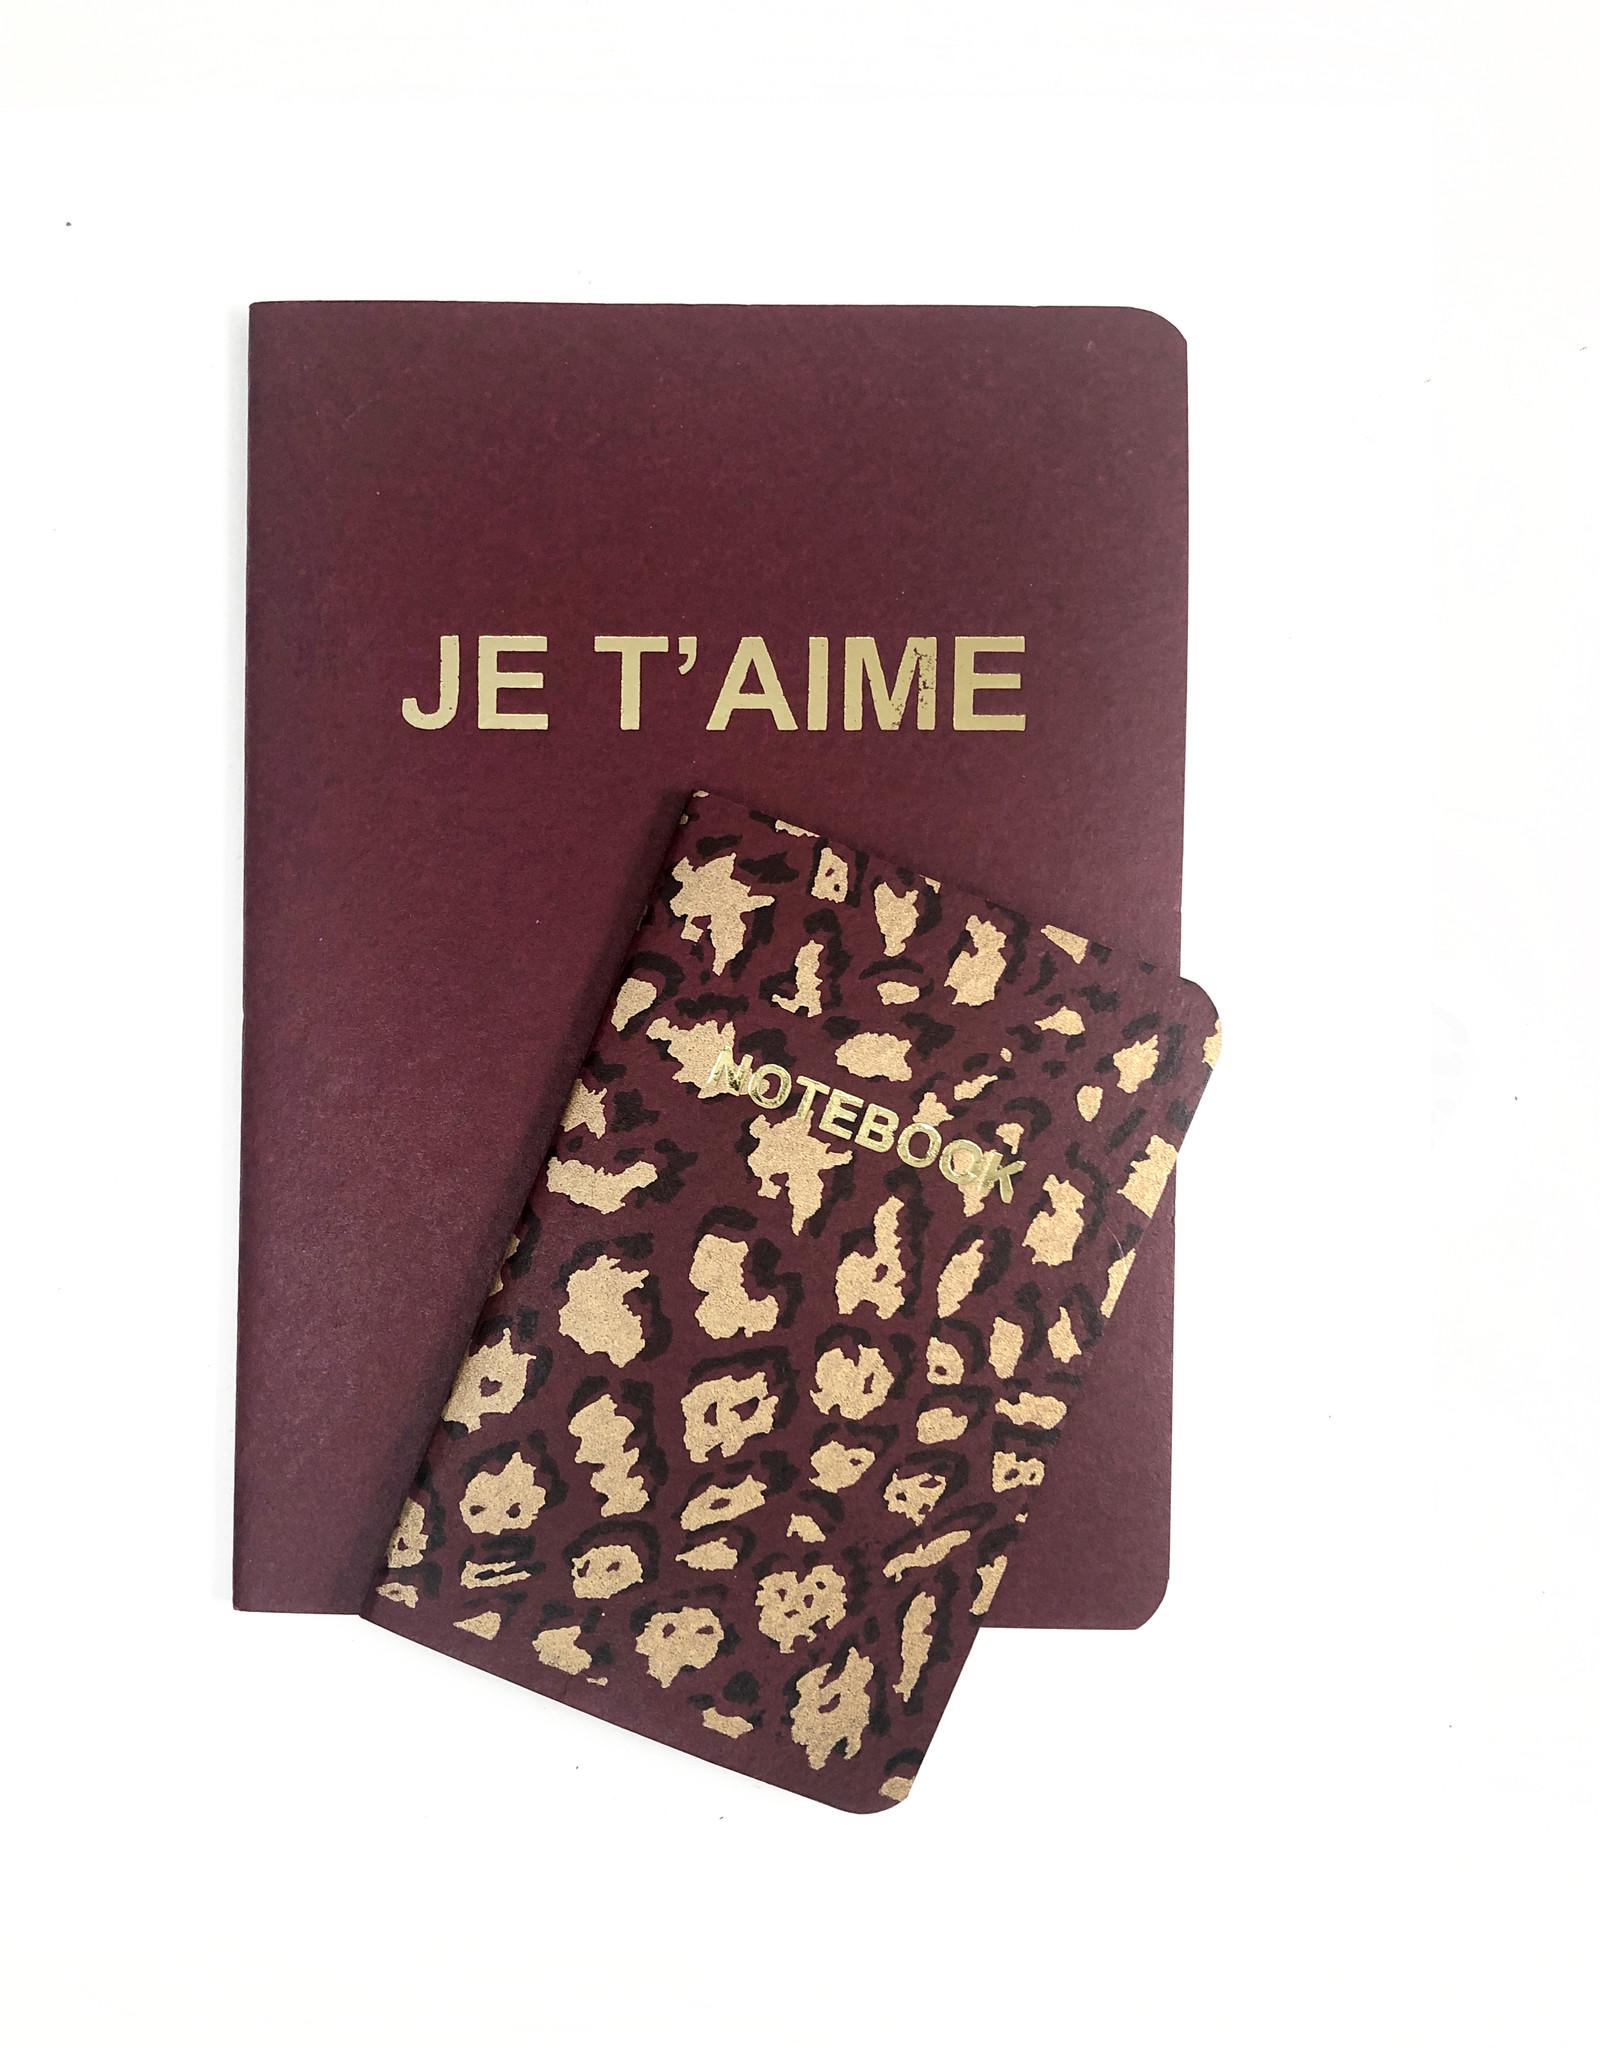 SET of 2, Soft Cover Notebooks, Windsor Je taime + Leopard